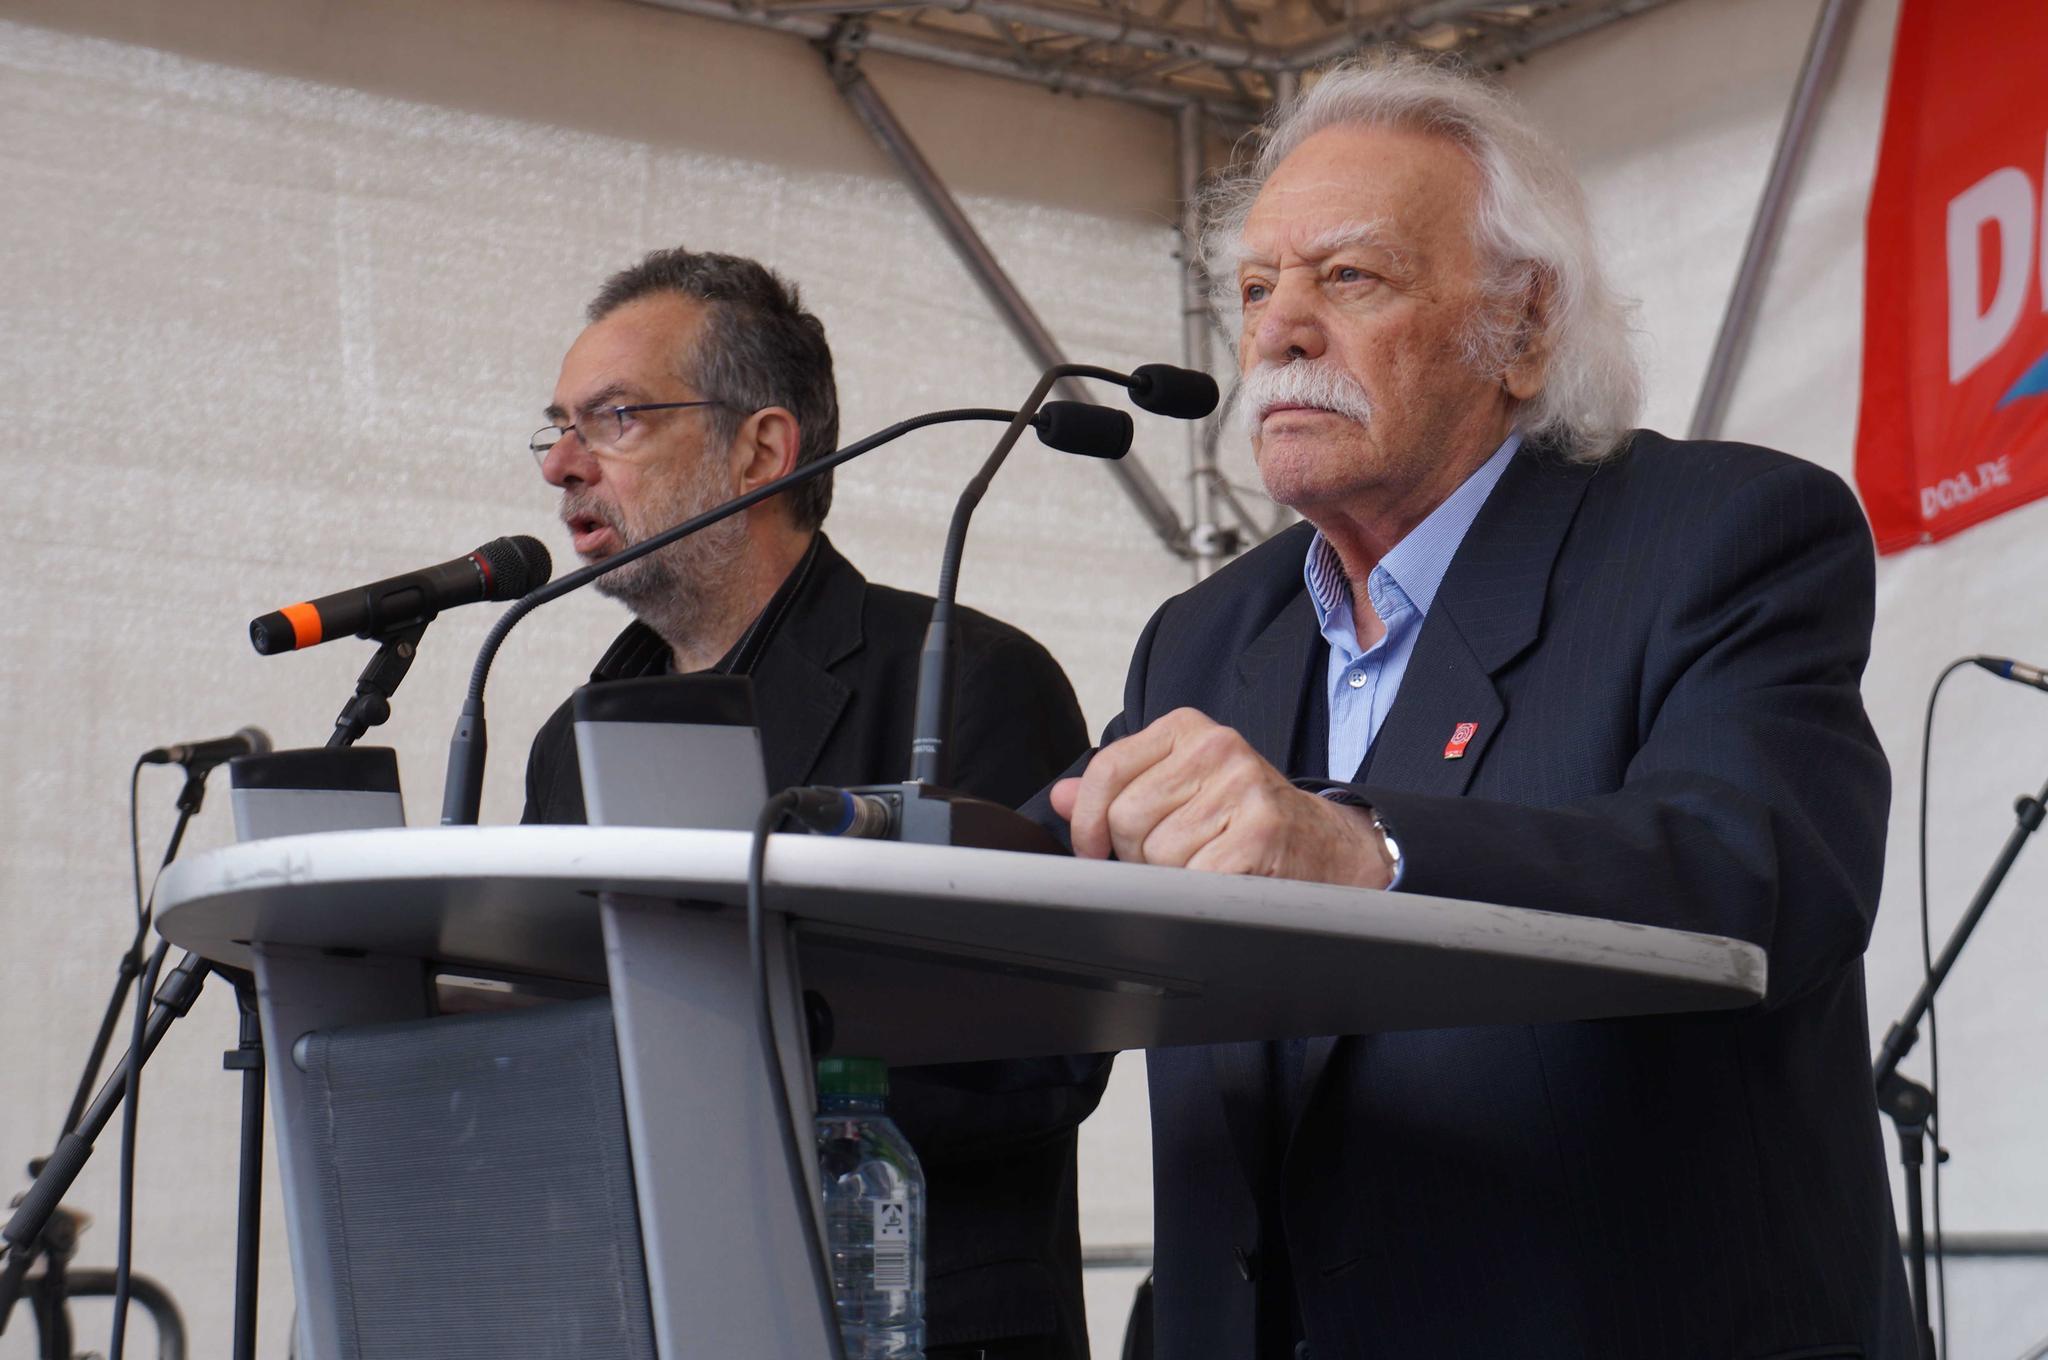 Manolis Glezos am Rednerpult